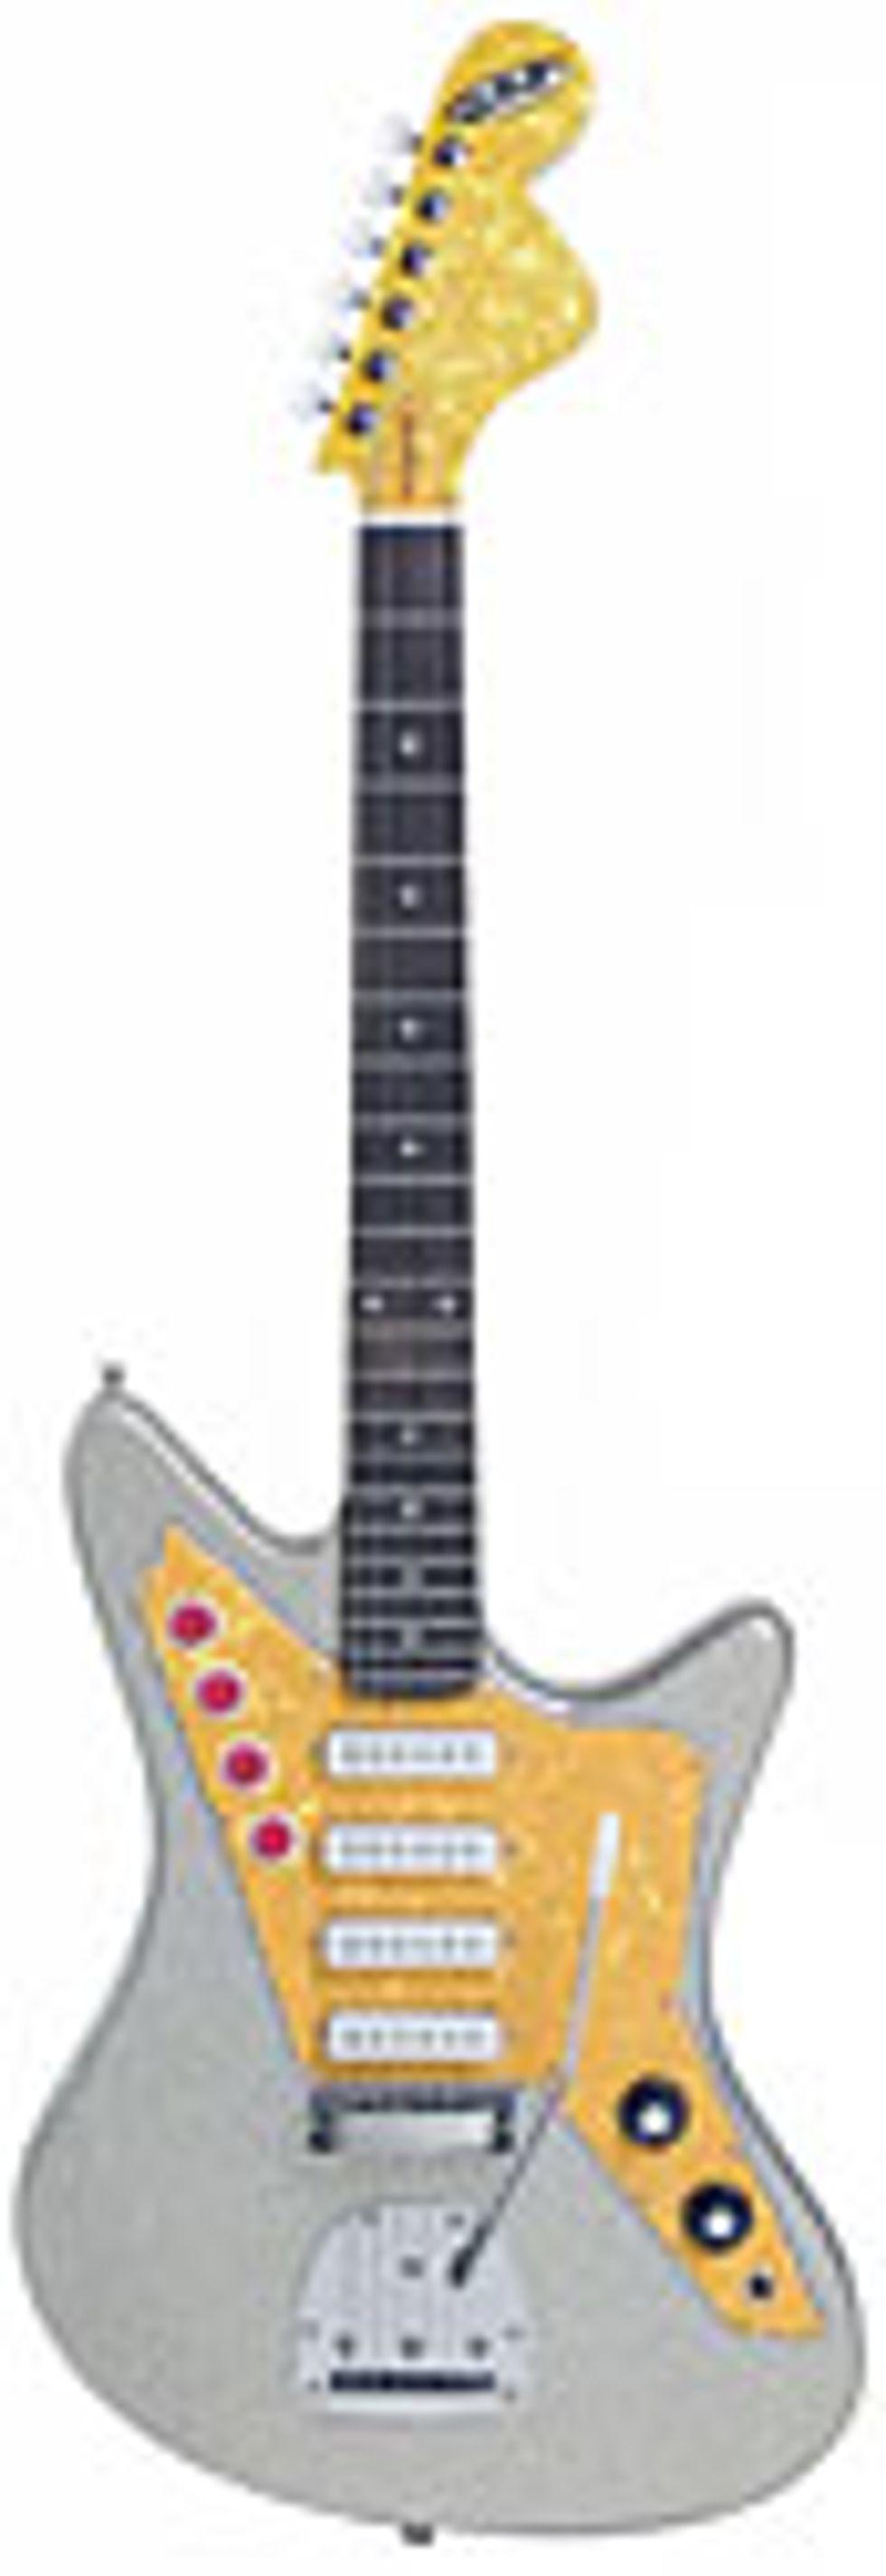 DiPinto Galaxie 4 Los Straitjackets Guitar